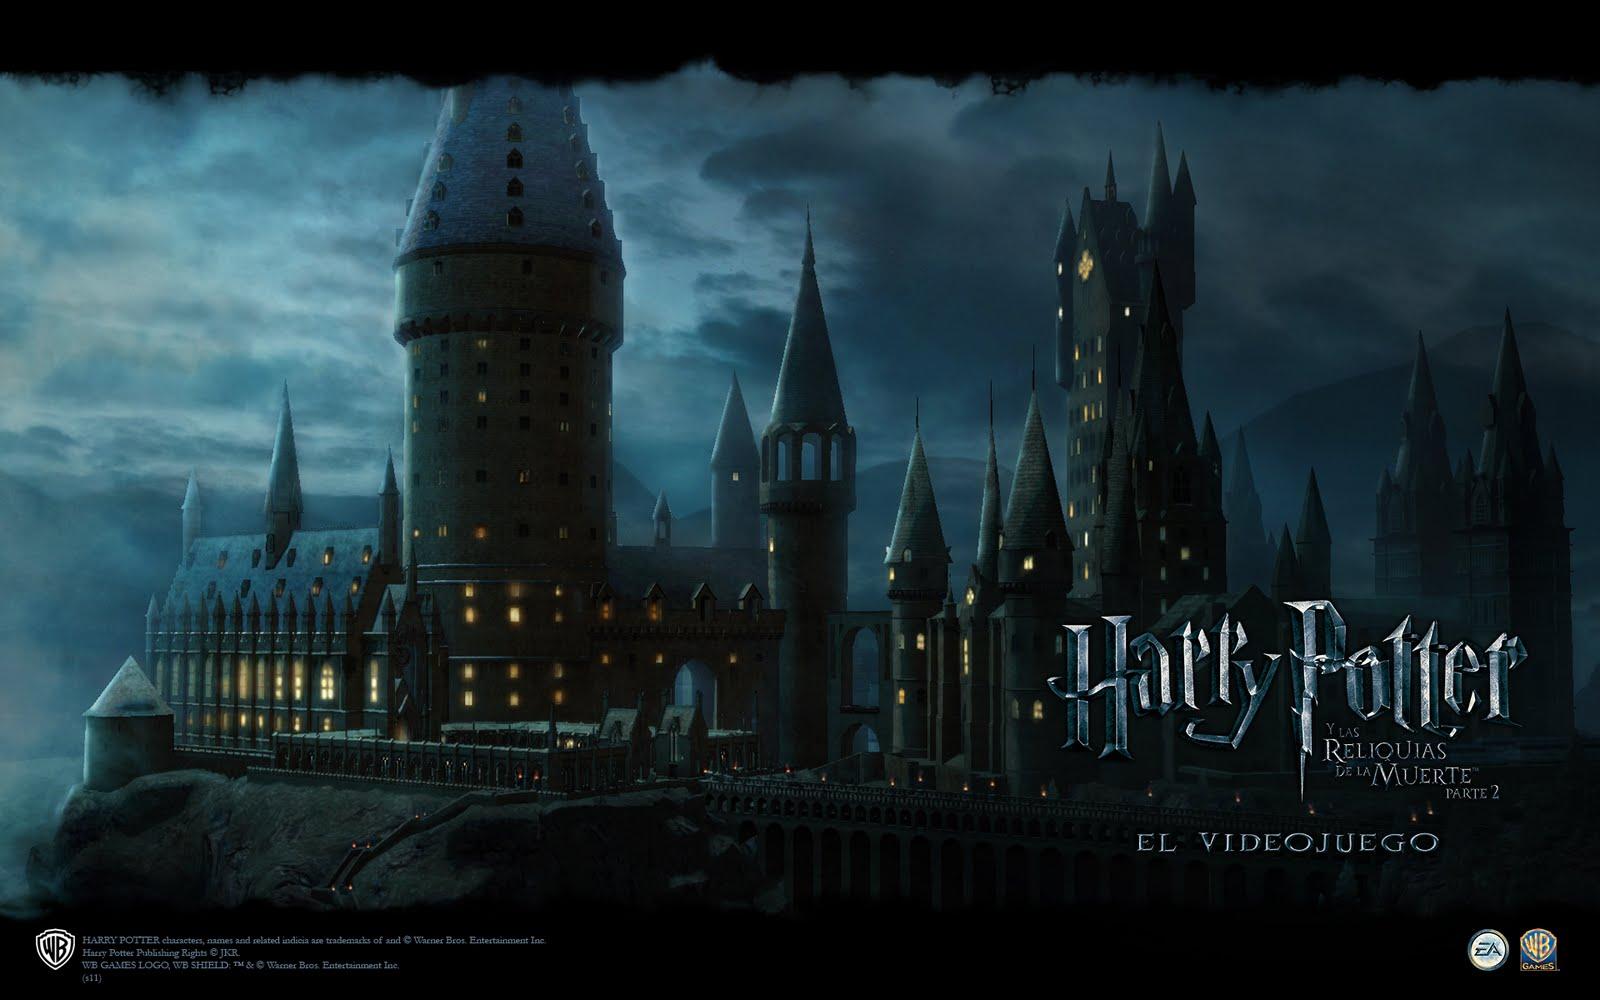 http://4.bp.blogspot.com/-DNOOM7fwMuA/TgS_zIGmYMI/AAAAAAAAAoI/6gwO0iv1VTw/s1600/1920x1200_Hogwarts_04_ESP.jpg